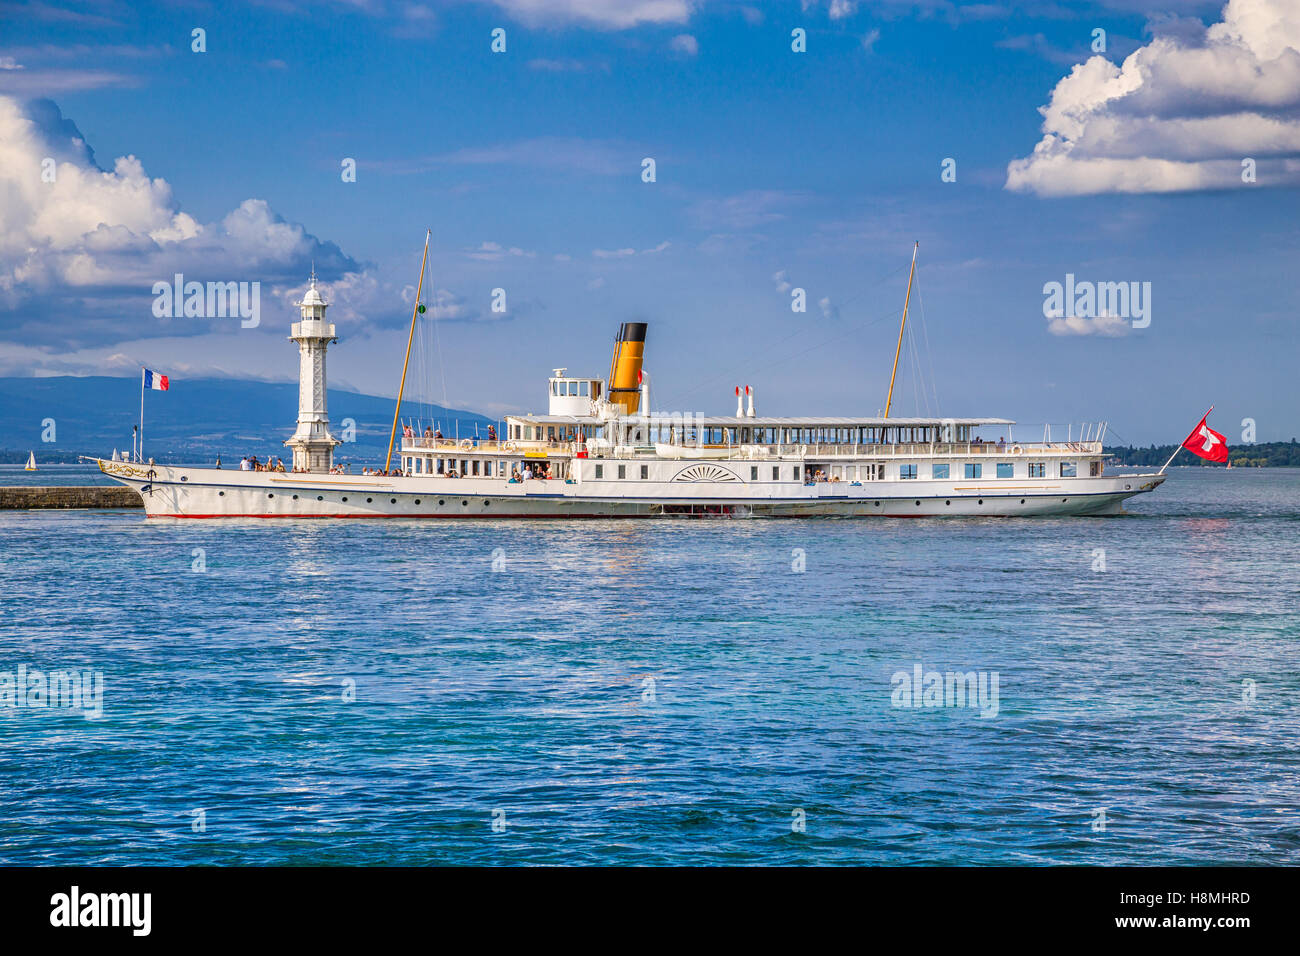 Traditional paddle steamer excursion ship with historic Les Paquis Lighthouse on famous Lake Geneva, Geneva, Switzerland - Stock Image